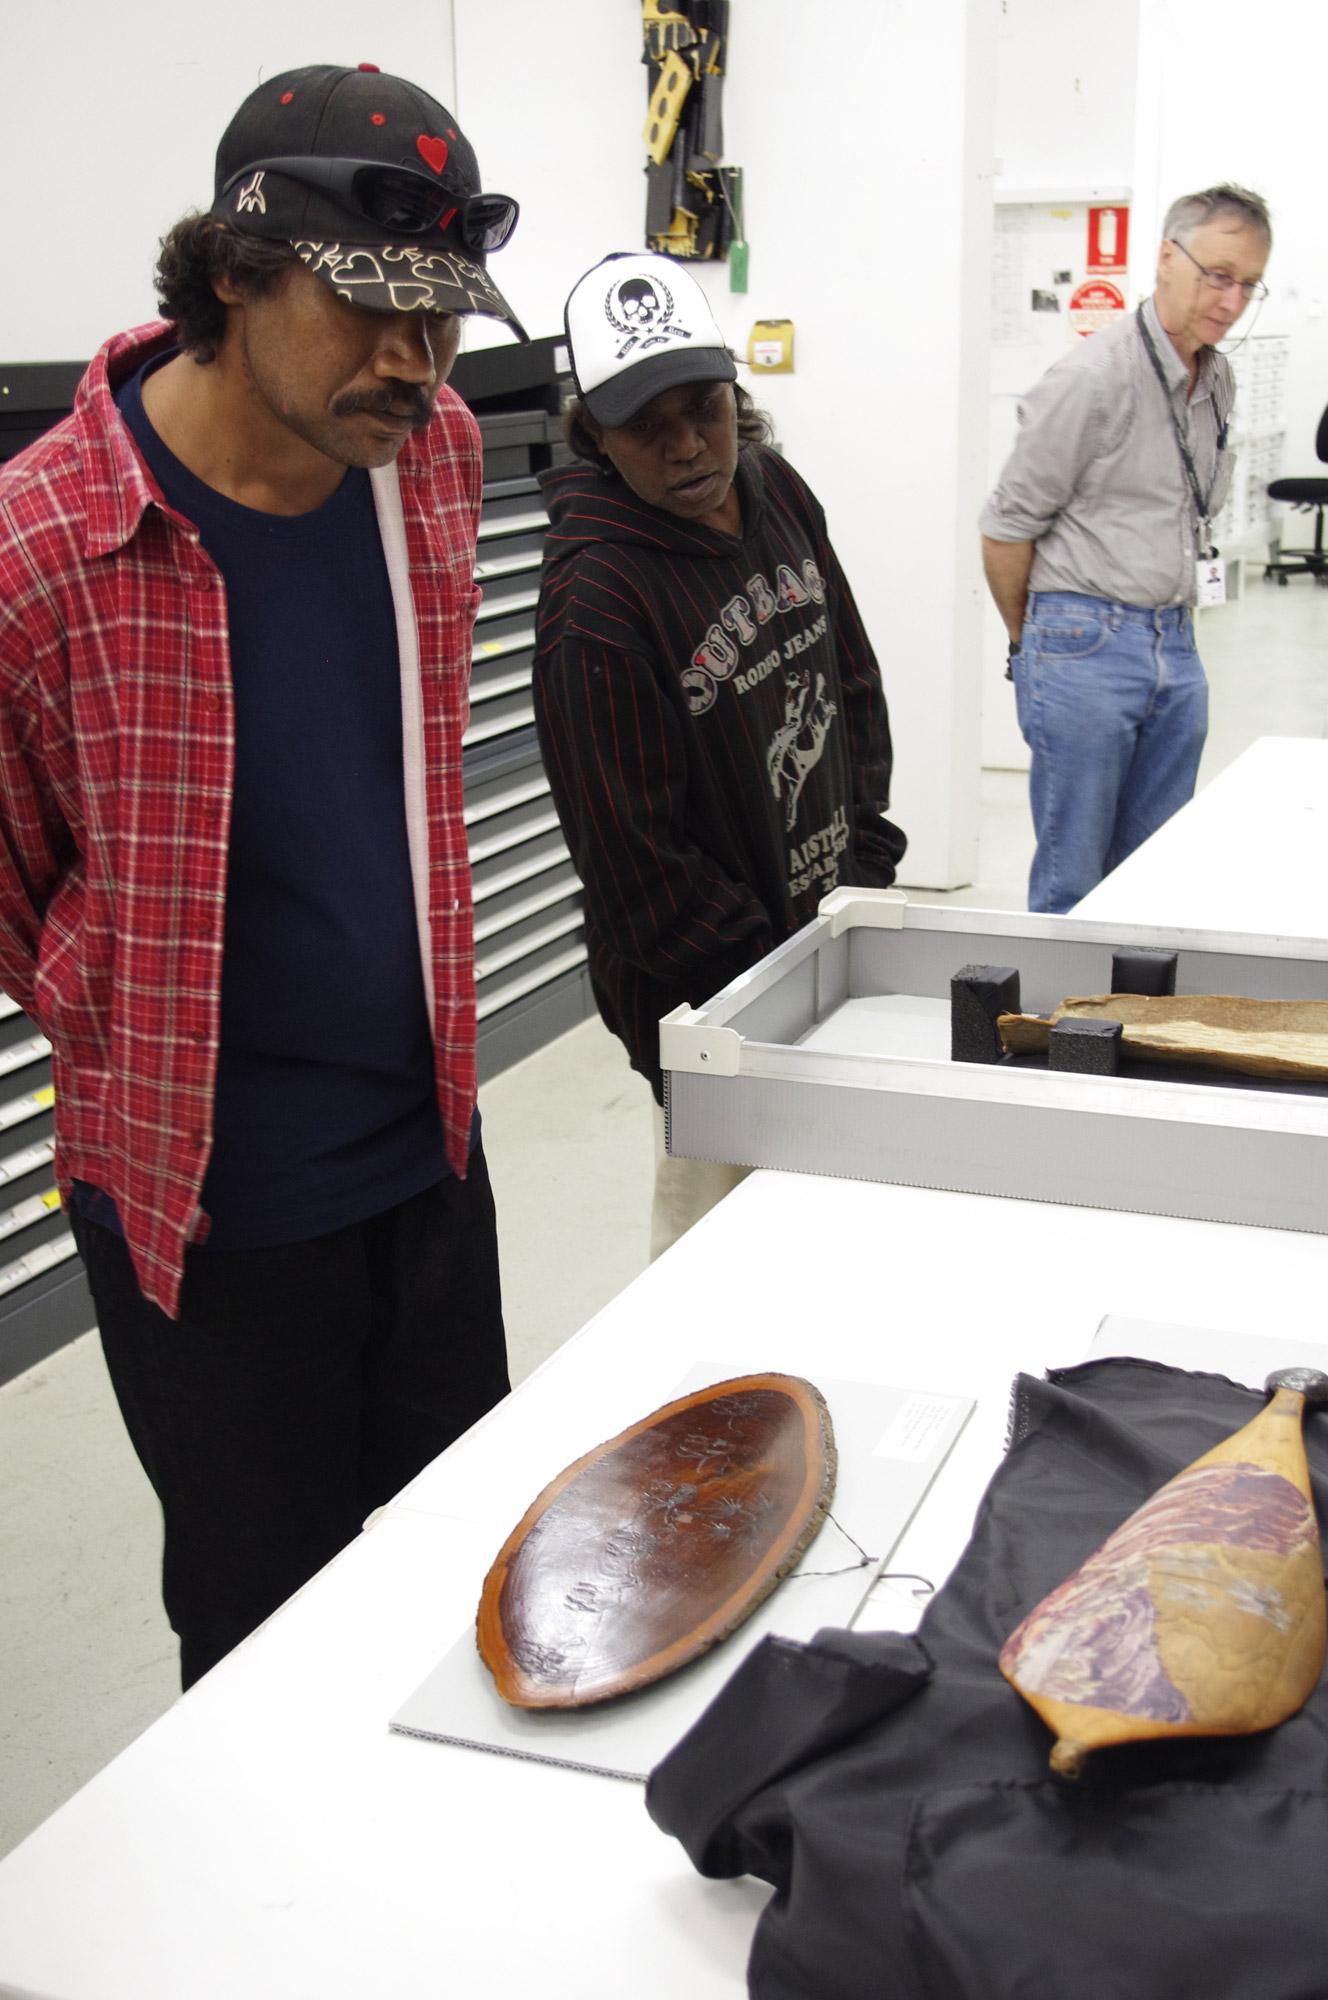 Vincent Namatjira visits QAGOMA